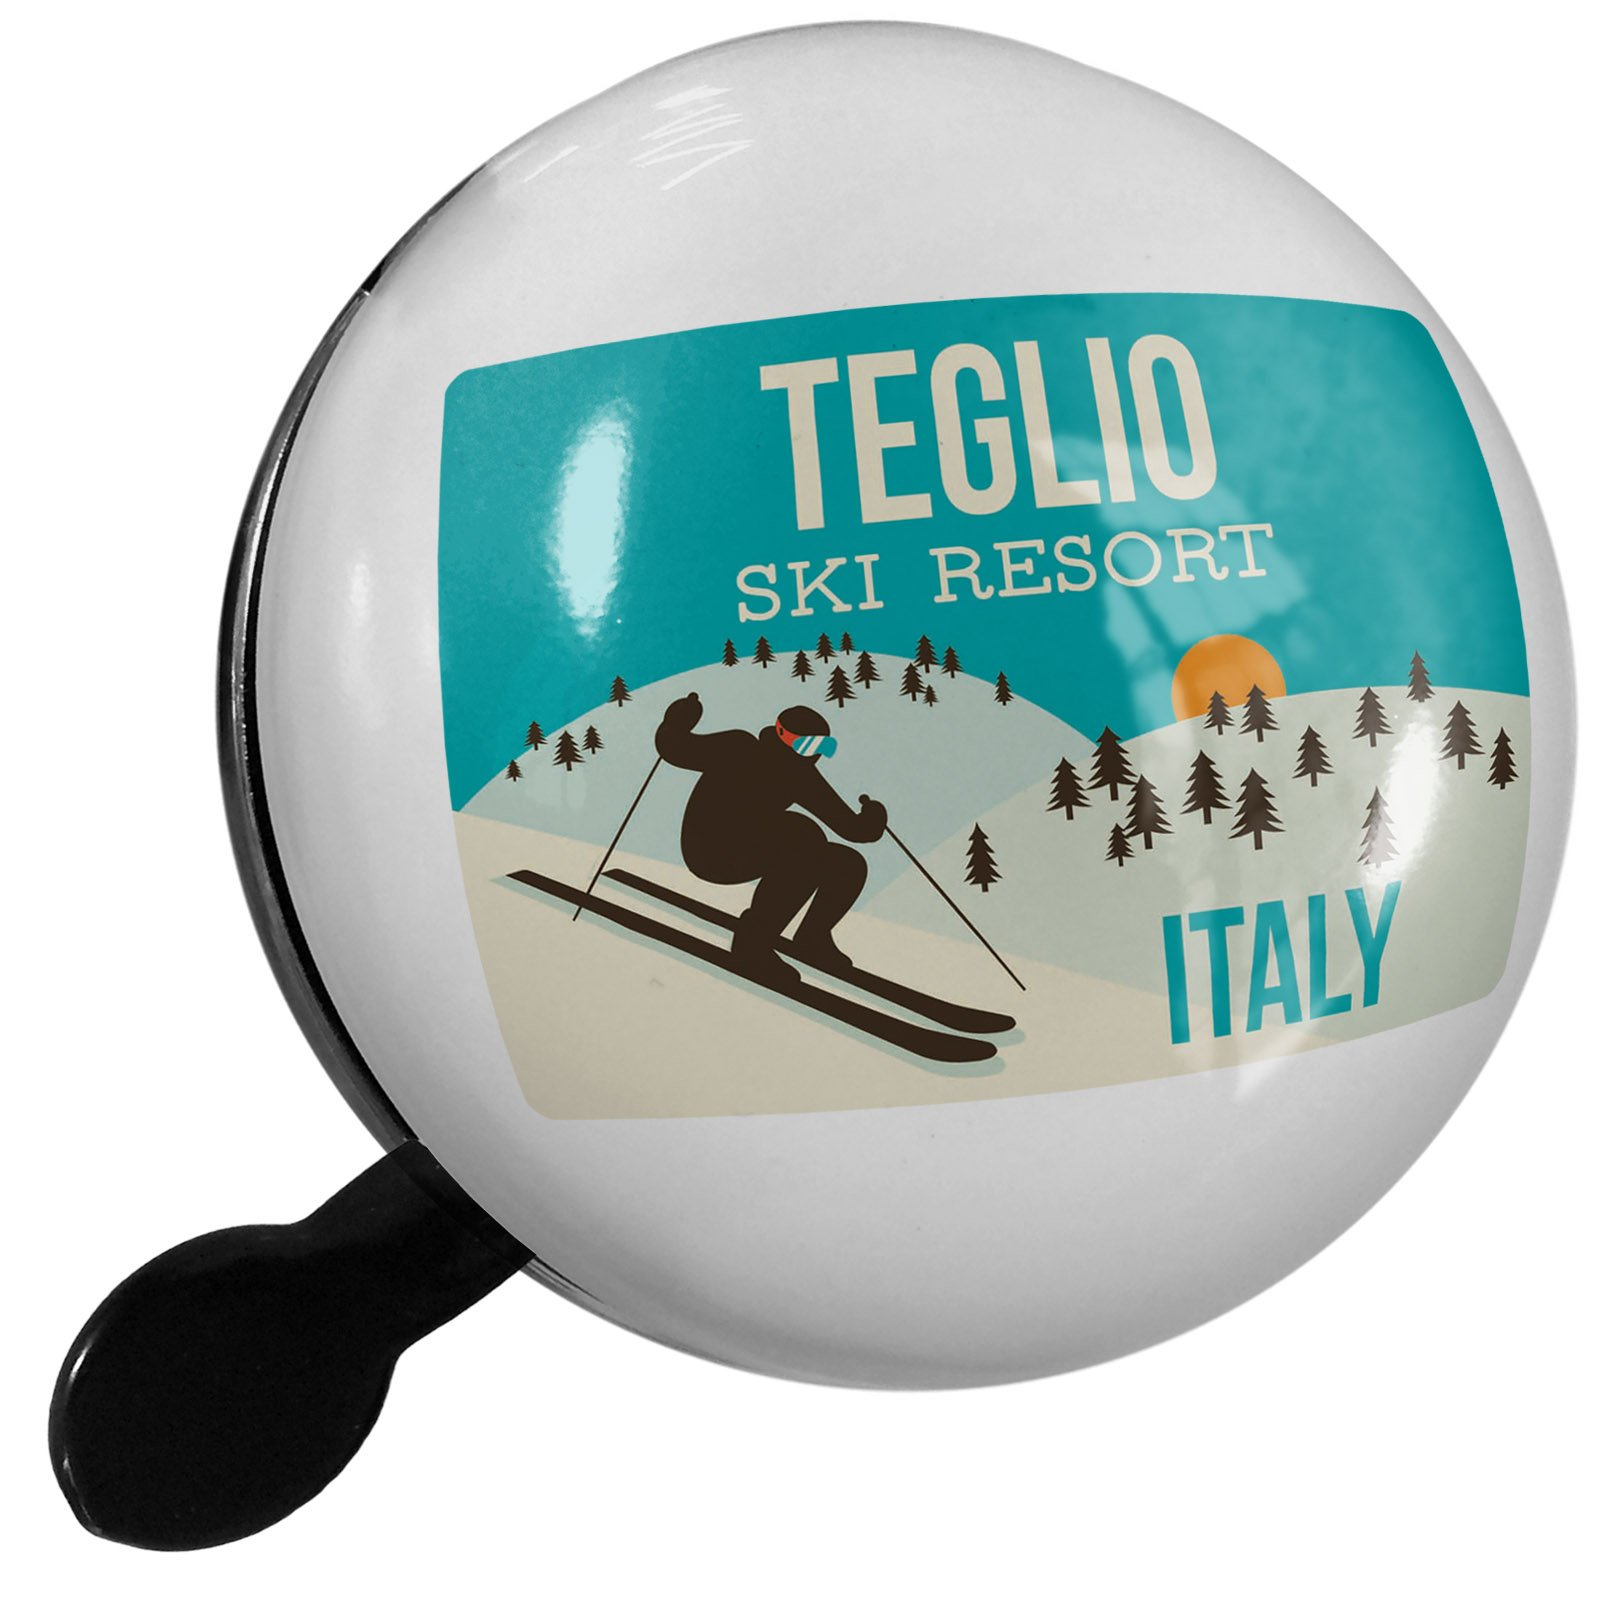 Small Bike Bell Teglio Ski Resort - Italy Ski Resort - NEONBLOND